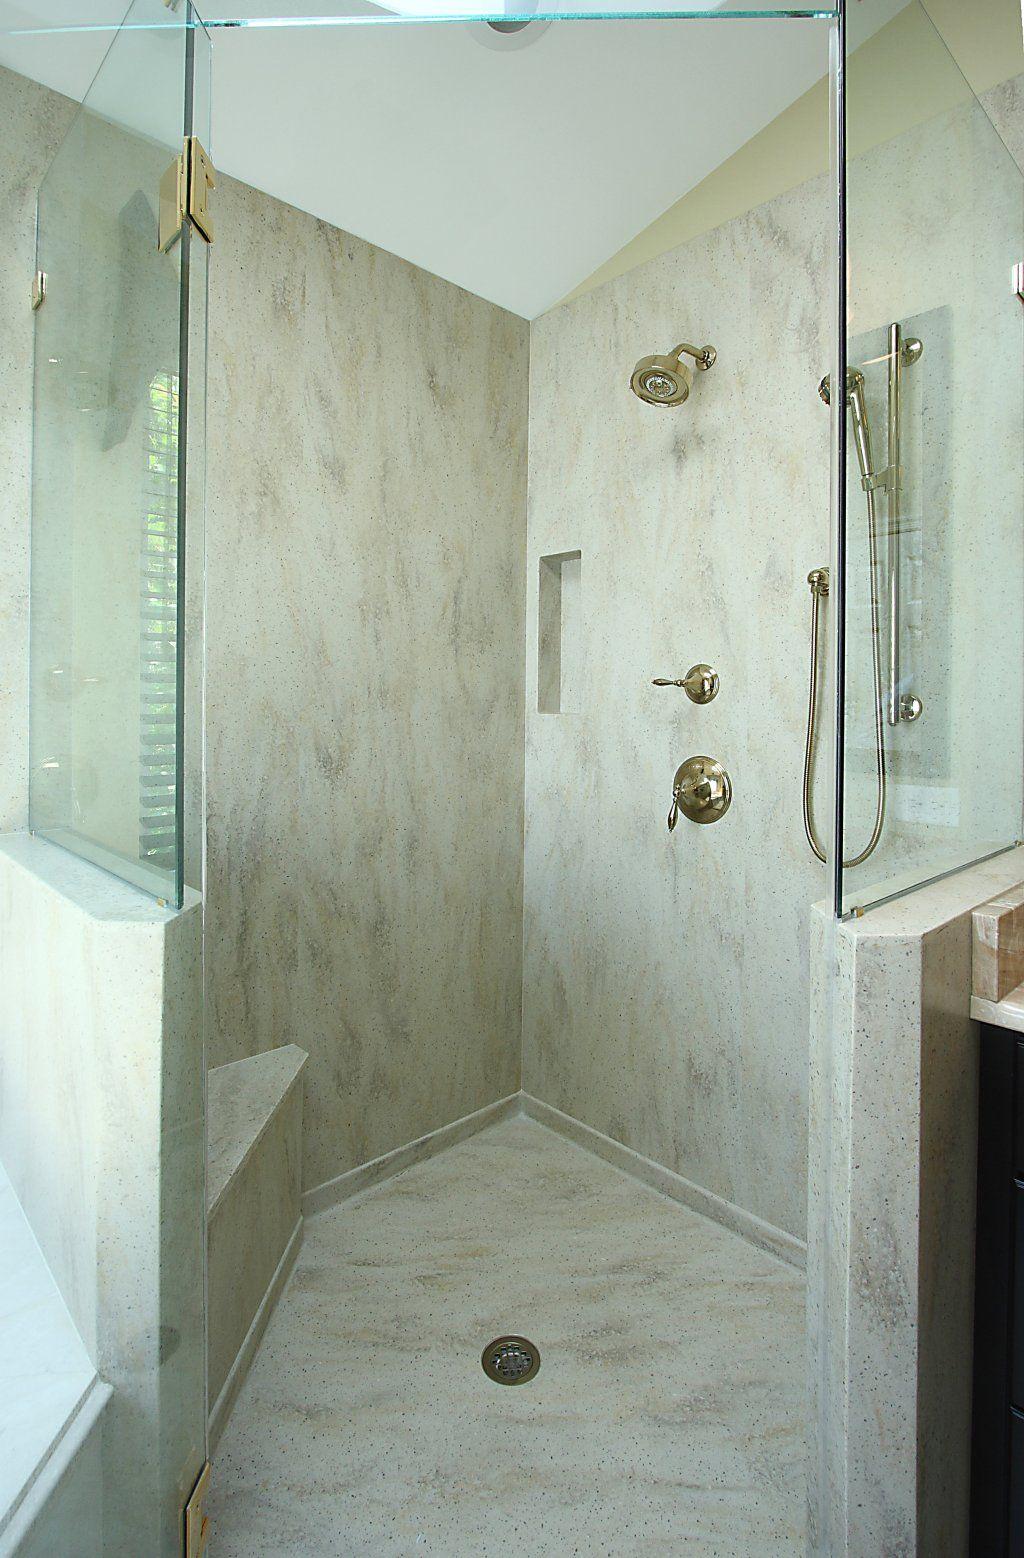 Best Corian Shower Pan For Your Shower Area Design Corian Shower